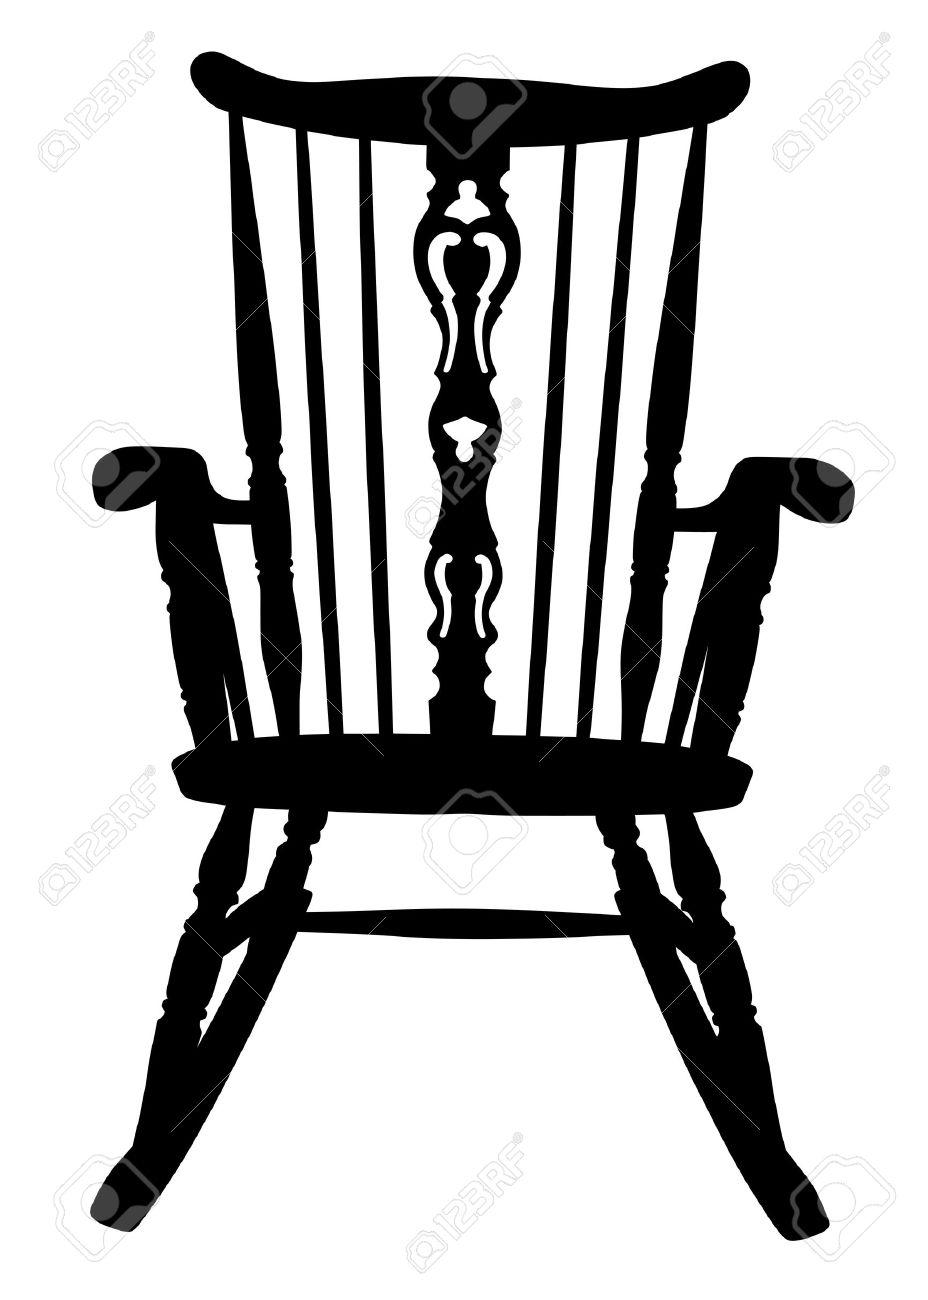 Rocking Chair Vector - Rocking chair vintage rocking chair stencil